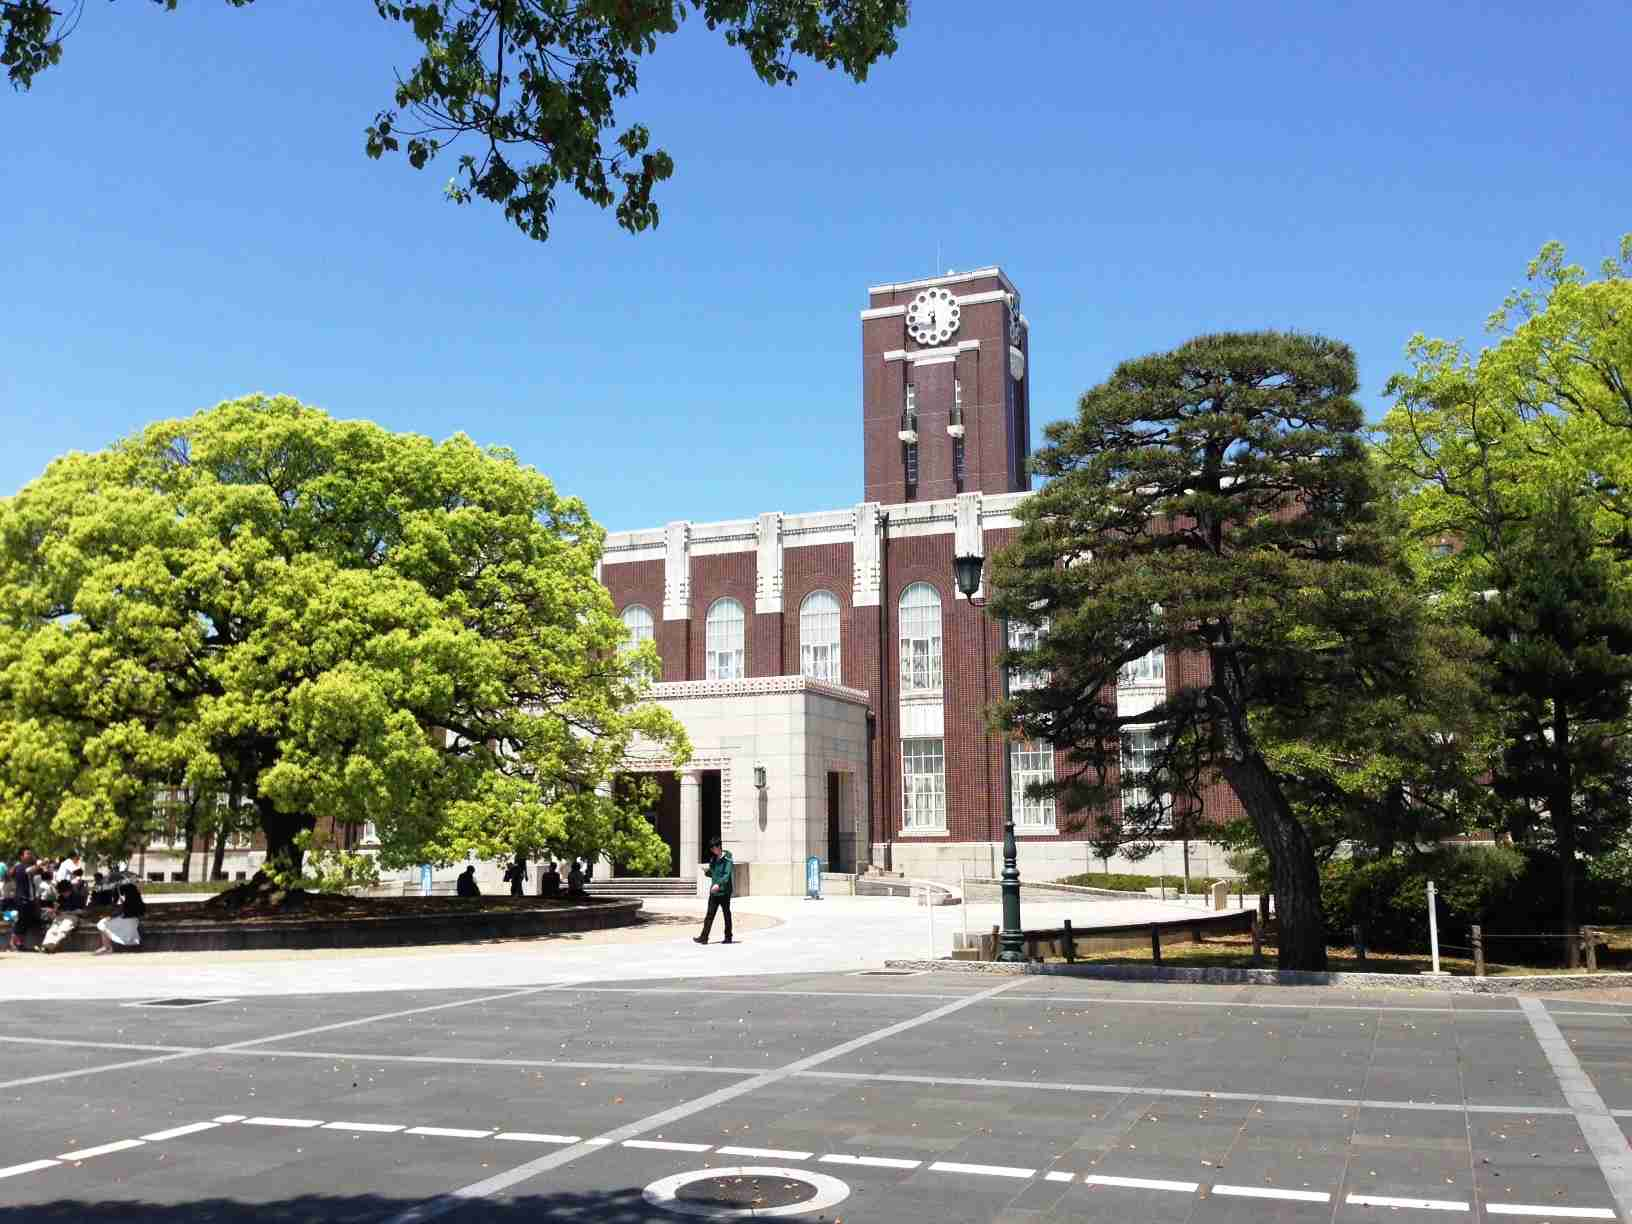 JASRAC、京大入学式の式辞HP掲載に著作権料を請求か ボブ・ディランの歌詞引用